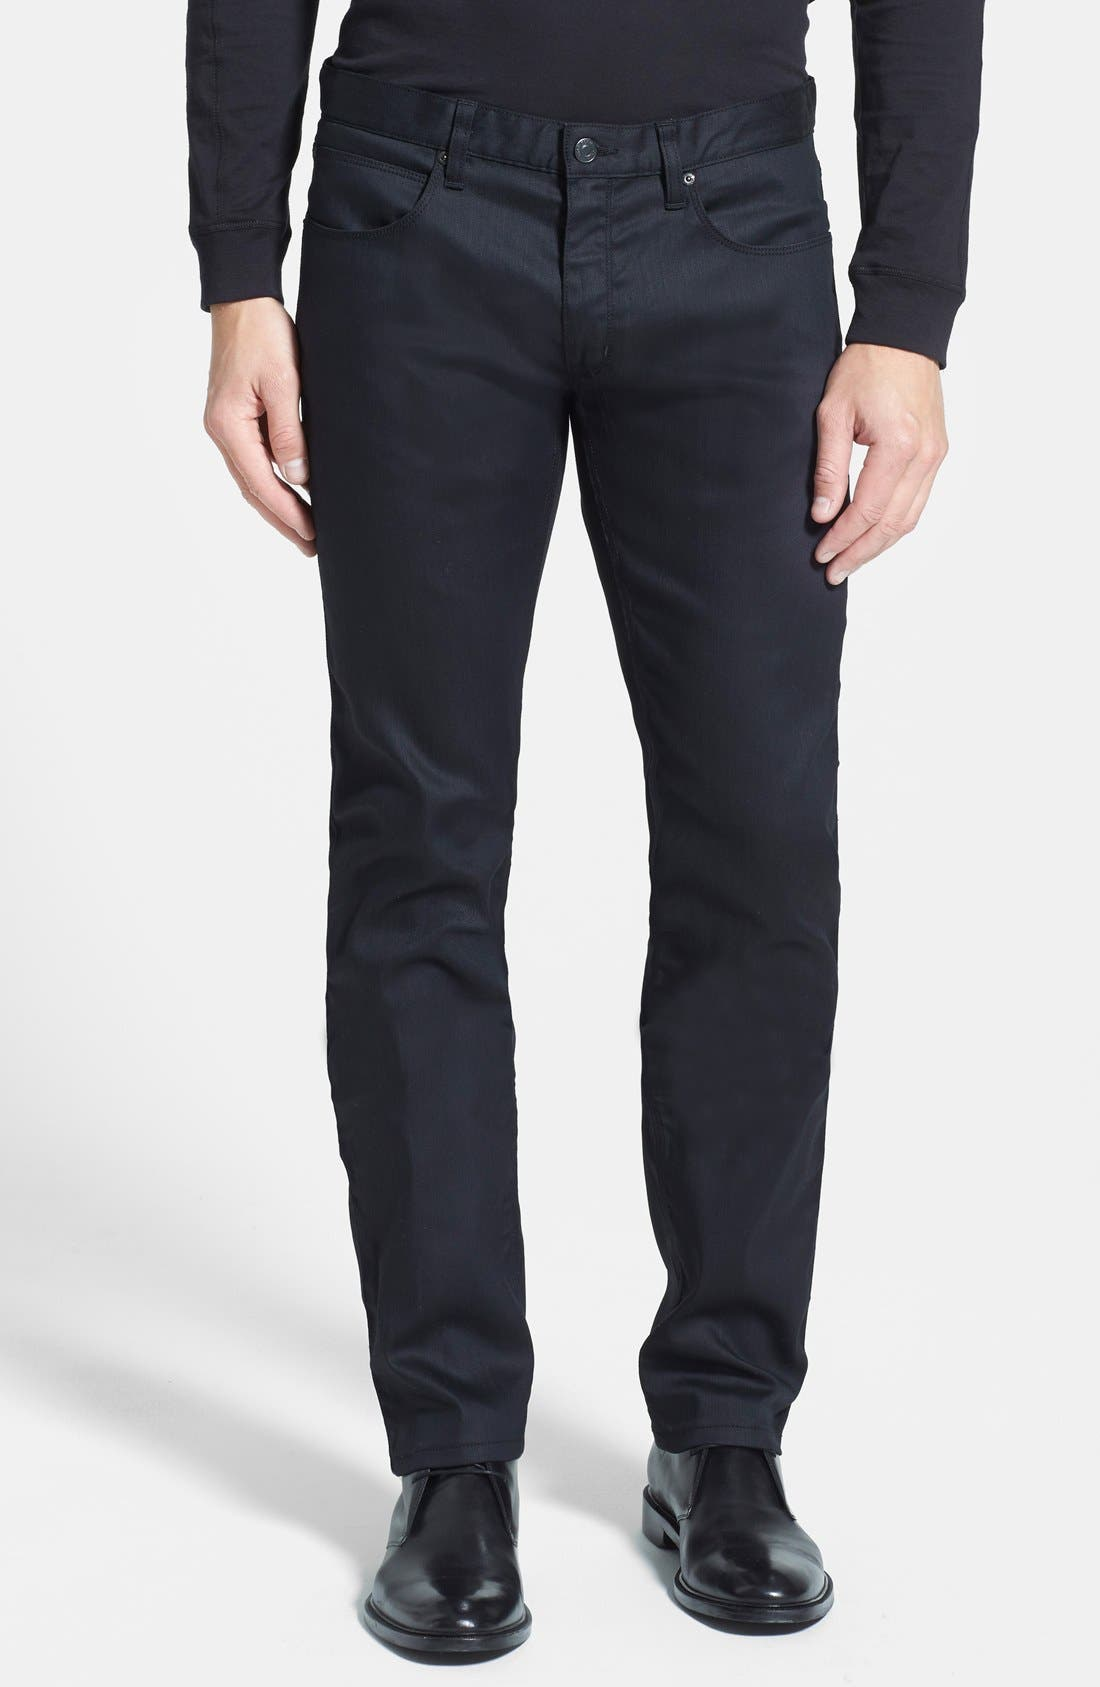 HUGO '708' Slim Fit Jeans,                             Main thumbnail 1, color,                             Black